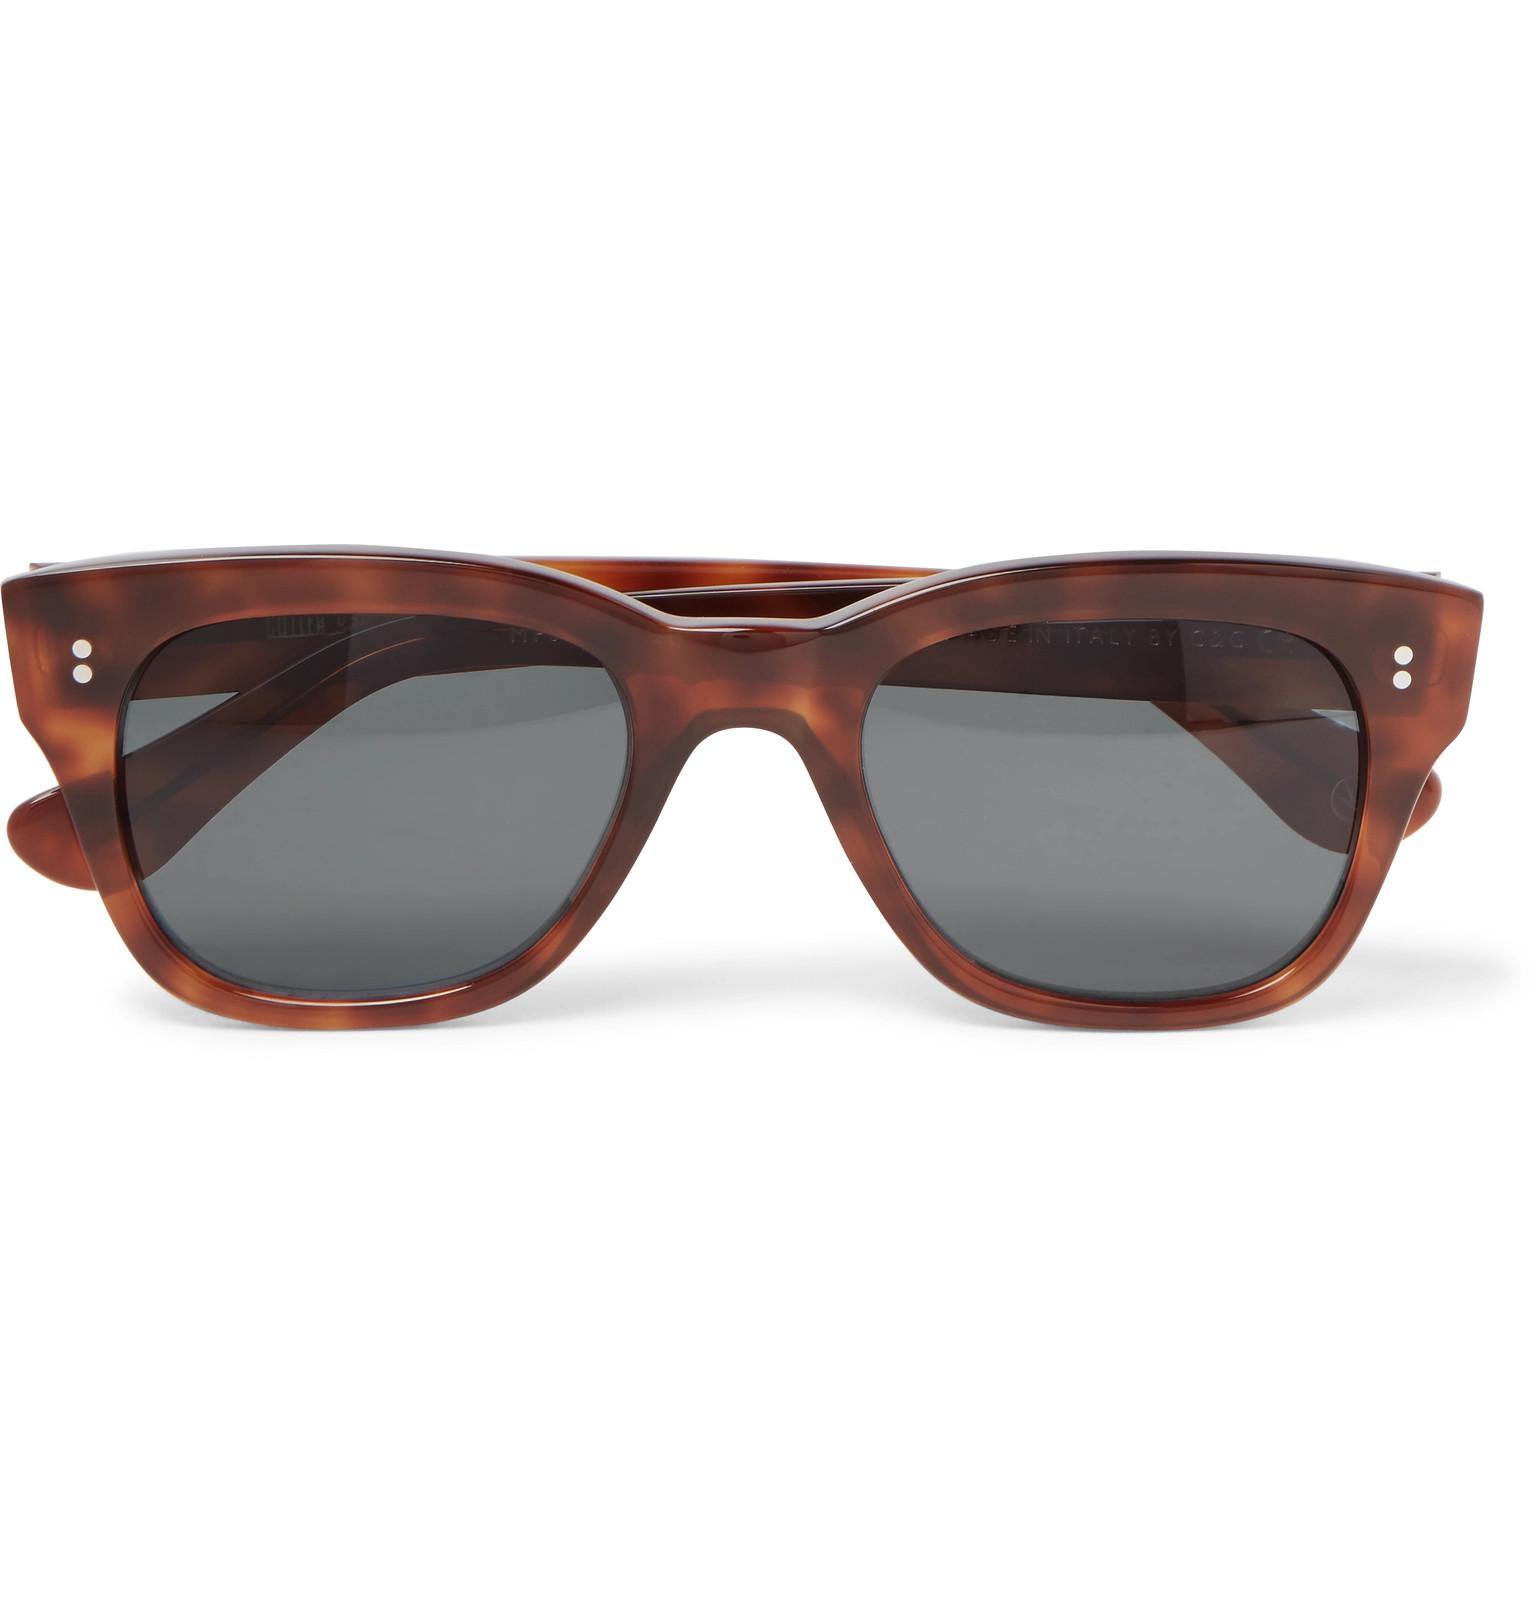 76862a0f31 Kingsman + Cutler And Gross D-frame Tortoiseshell Acetate Sunglasses ...